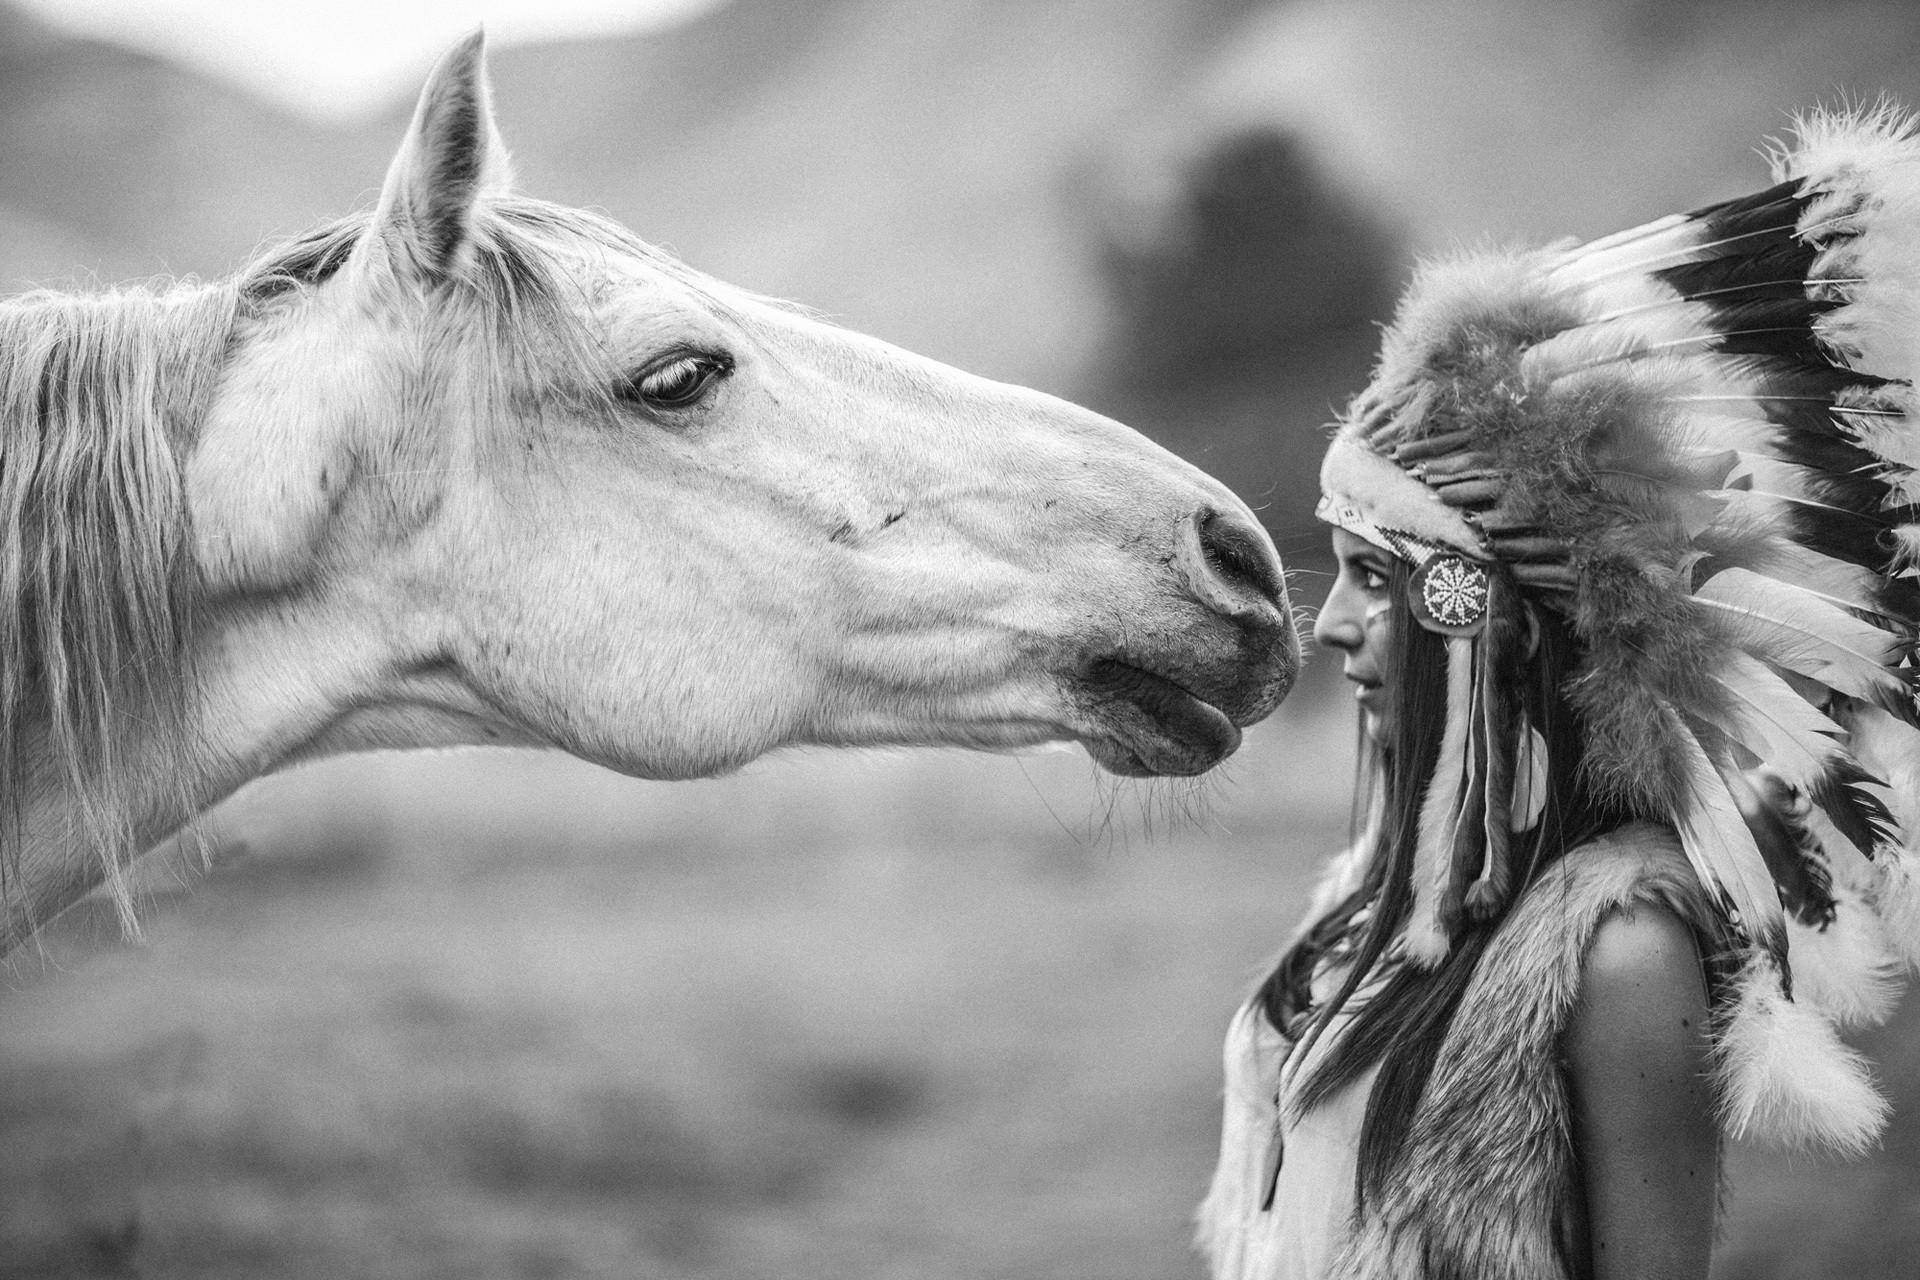 People 1920x1280 monochrome horse headdress animals women feathers model brunette long hair women outdoors headband Native American clothing depth of field fur muzzles sacrilege outdoors mammals